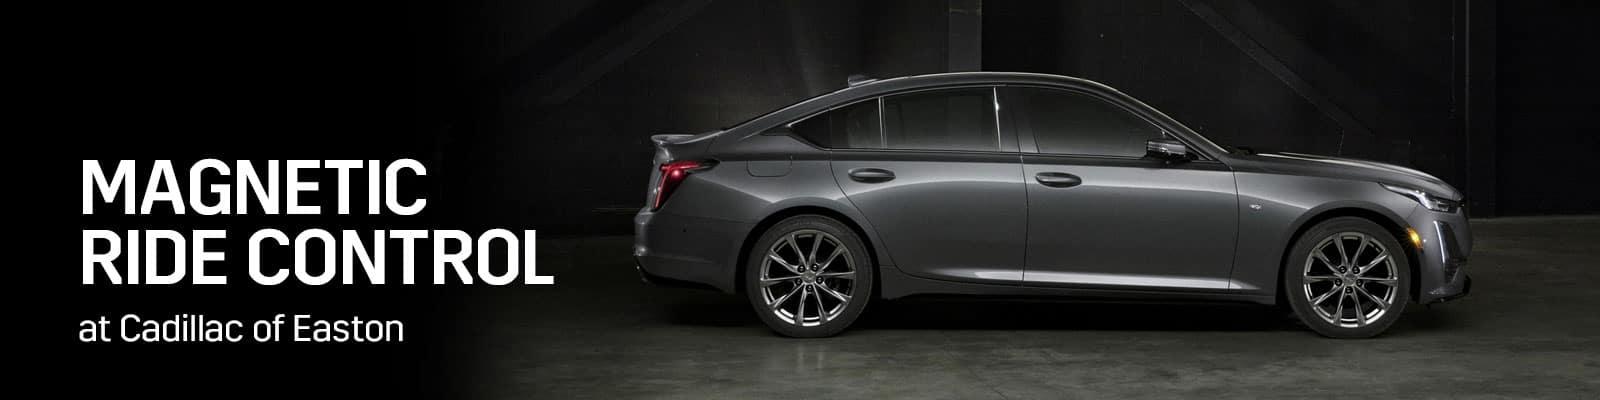 Cadillac Magnetic Ride Control - Germain Cadillac of Easton